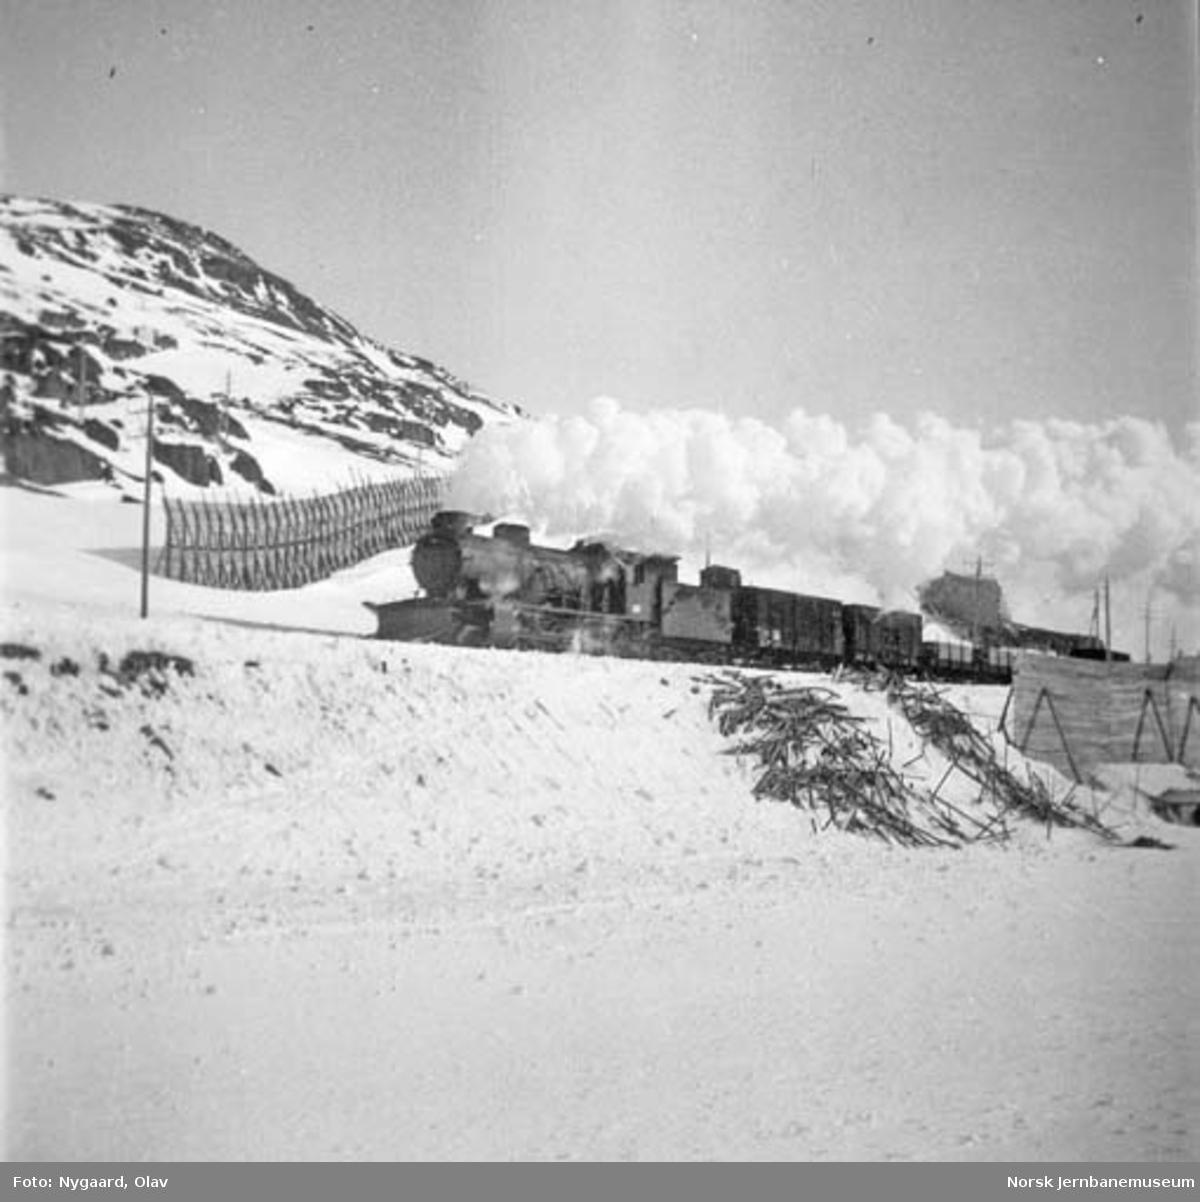 Damplokomotiv type 39a med godstog på Bergensbanen